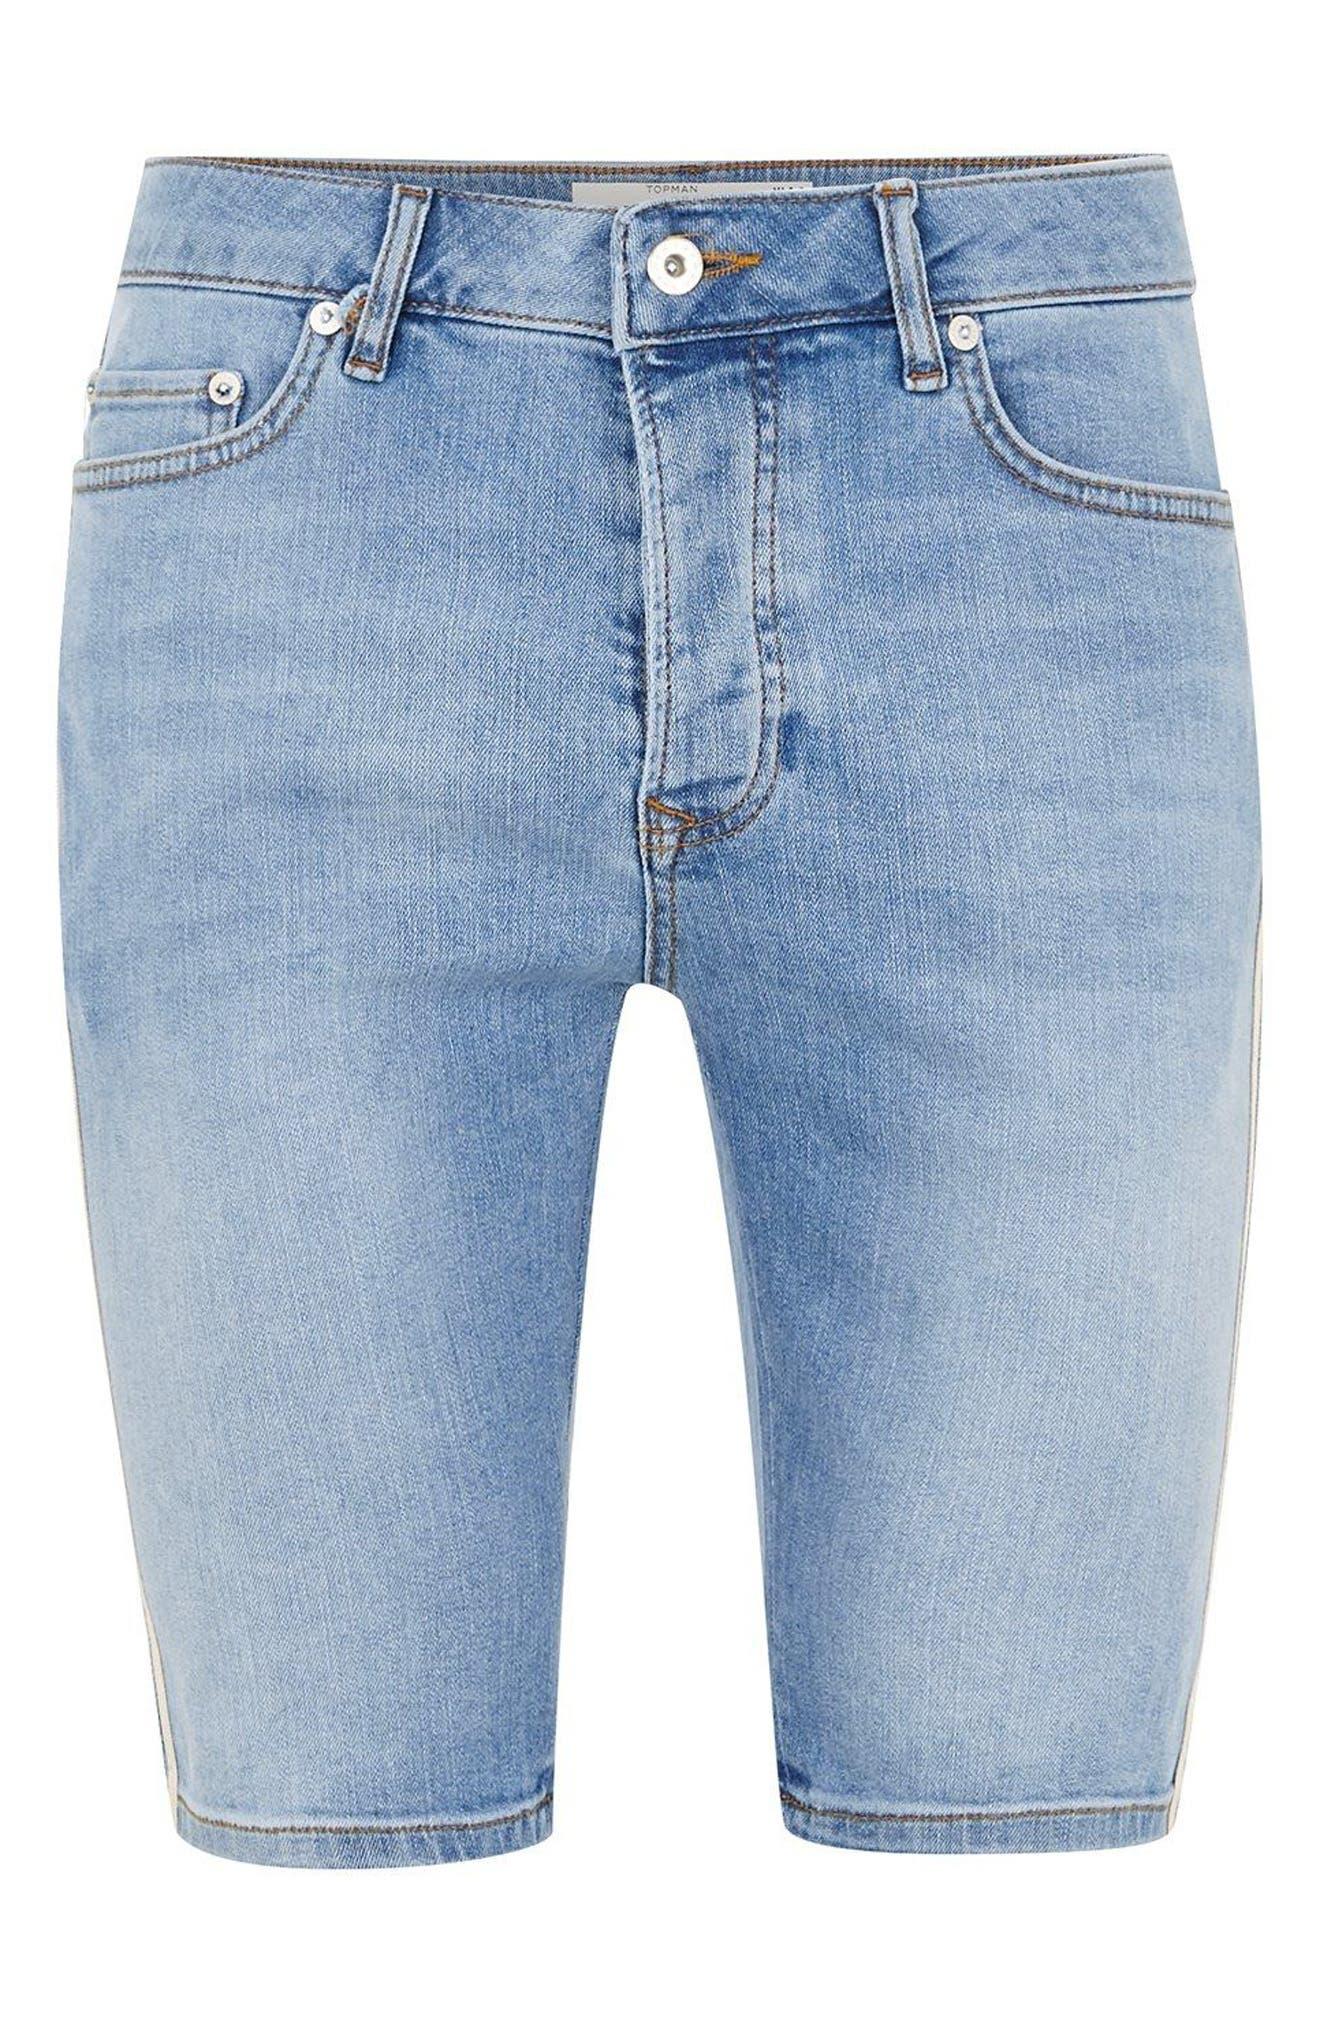 Tape Stretch Skinny Fit Denim Shorts,                             Alternate thumbnail 3, color,                             Blue